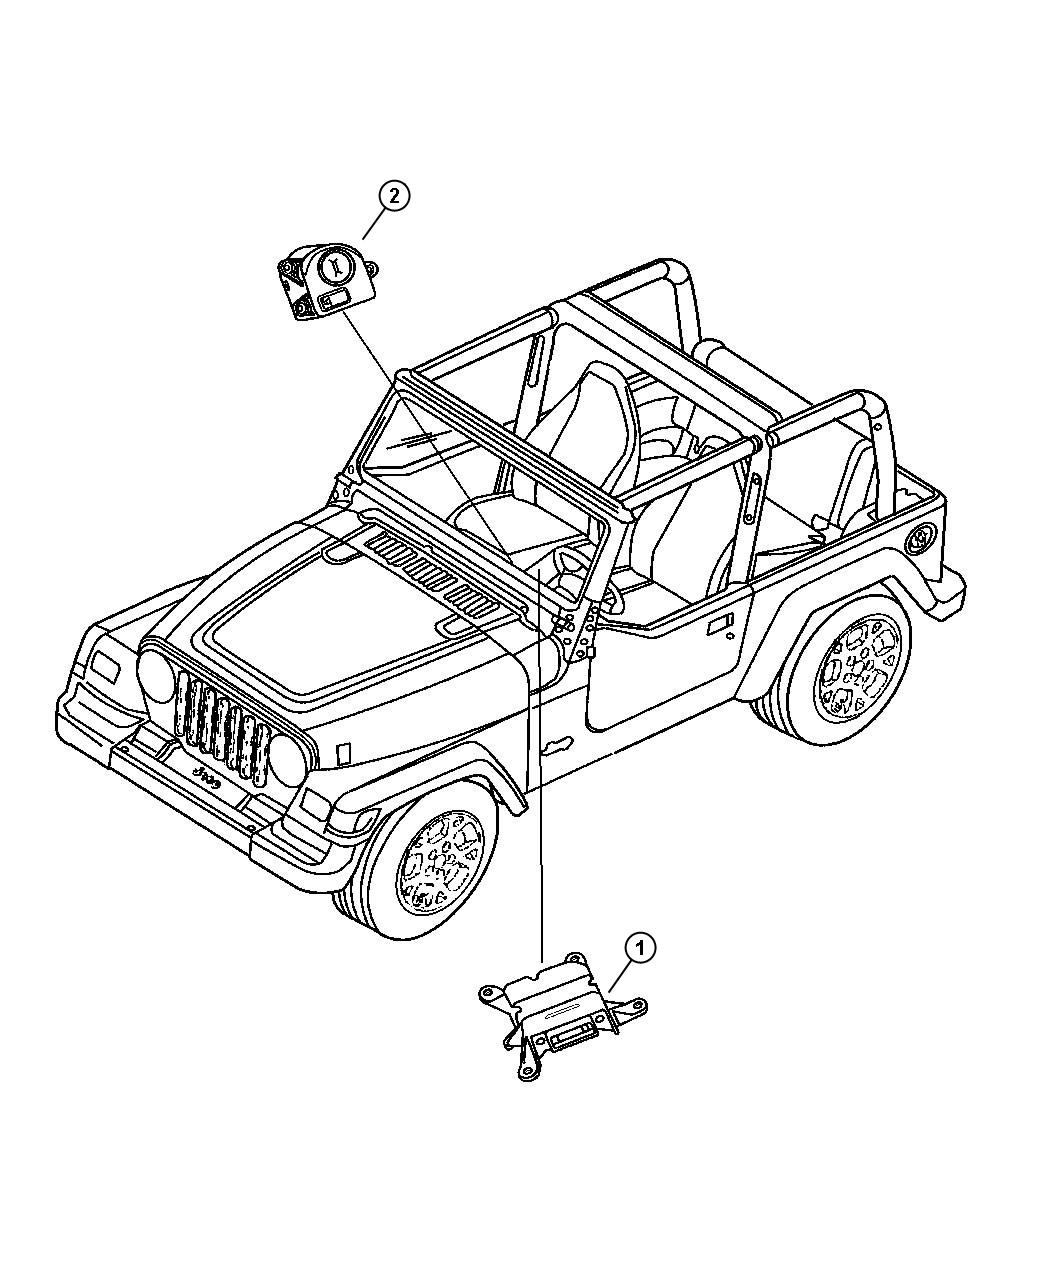 2001 Jeep Wrangler Switch. Passenger airbag disarm. Air